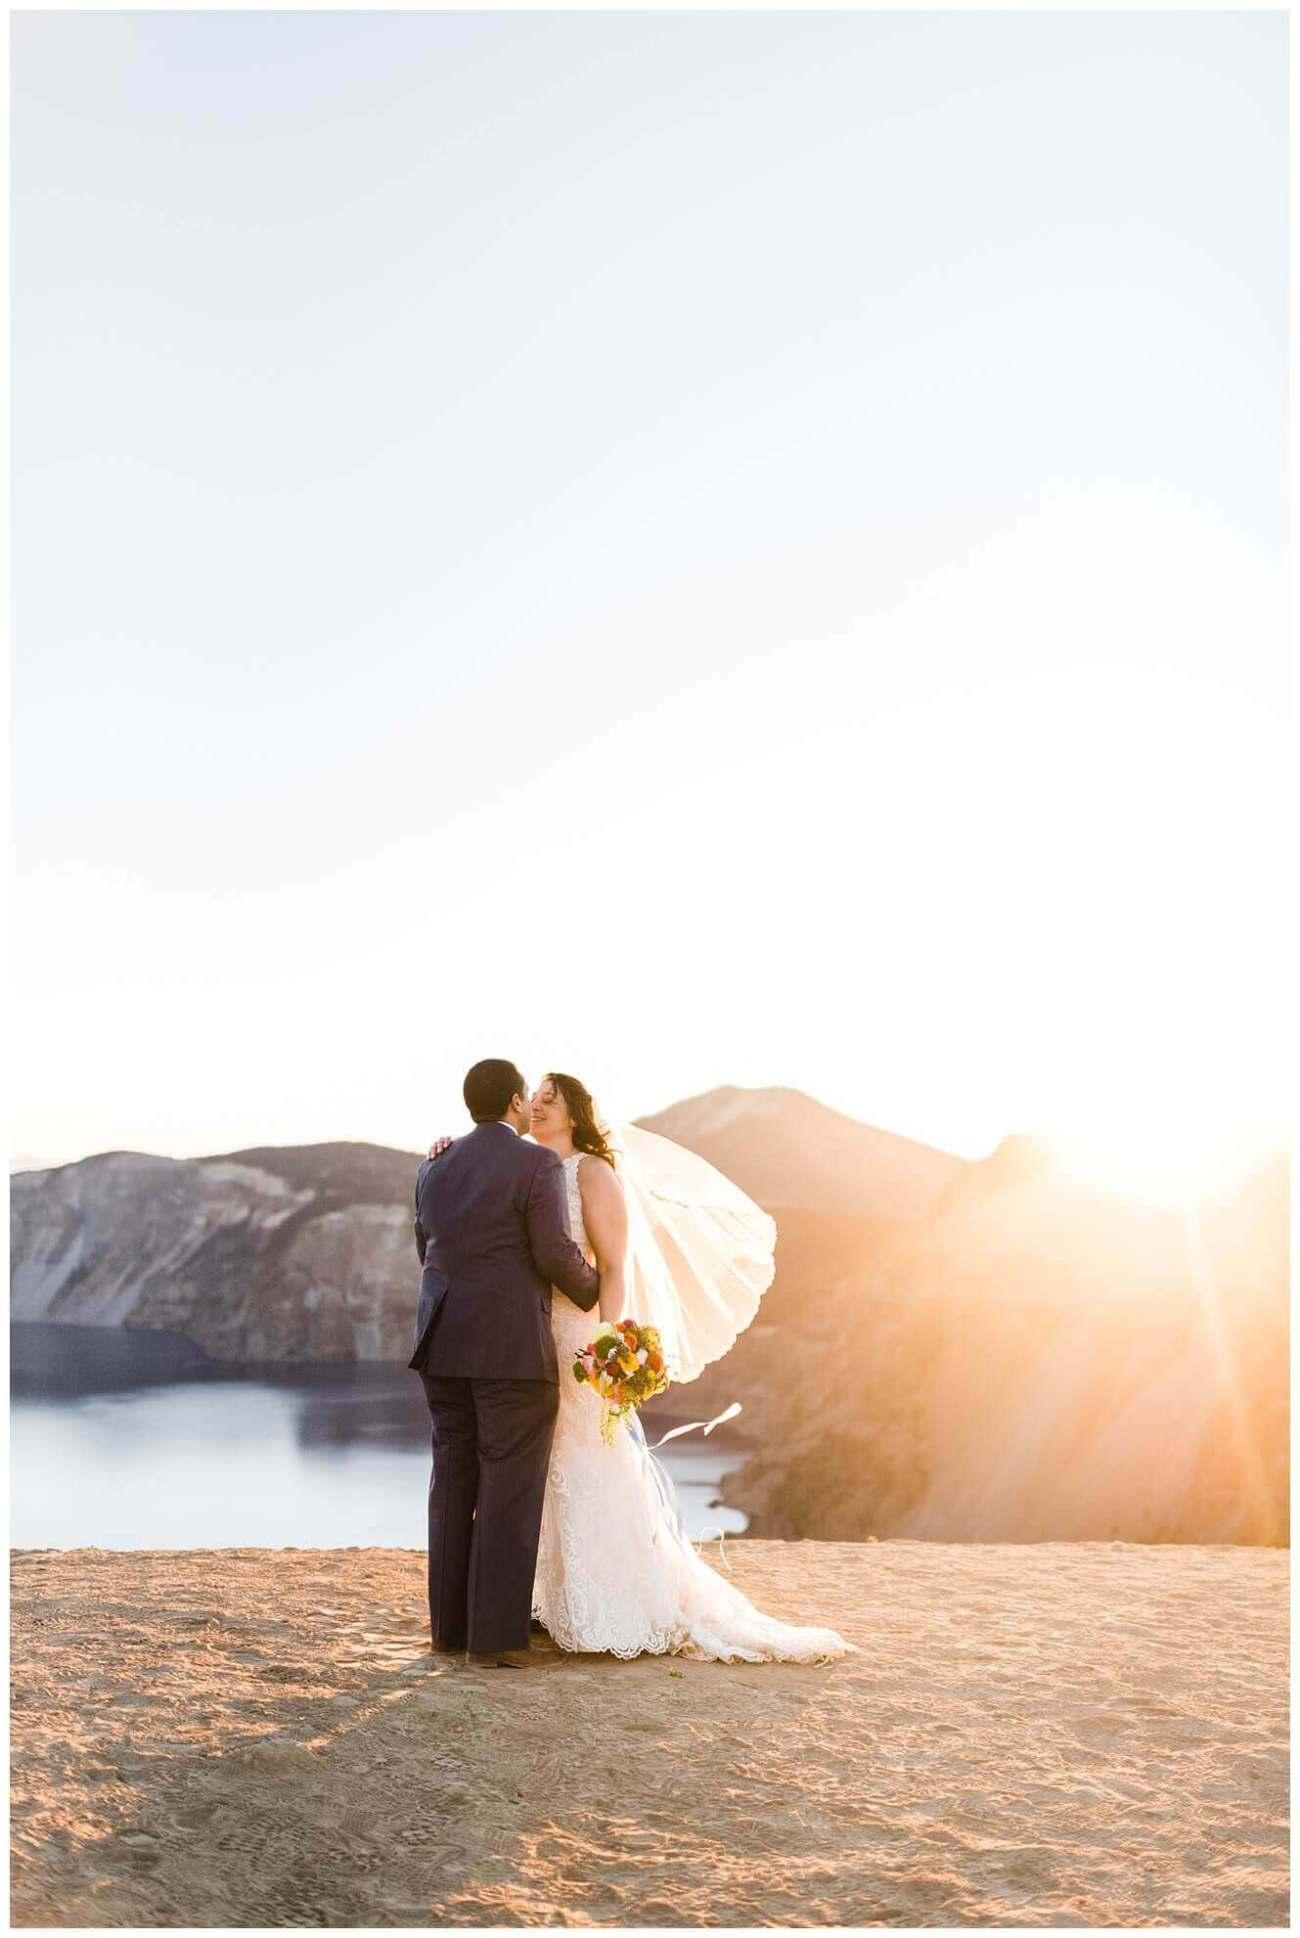 Crater Lake,adventure elopements,adventure photographer,elopement,national park,oregon,pacific northwest,